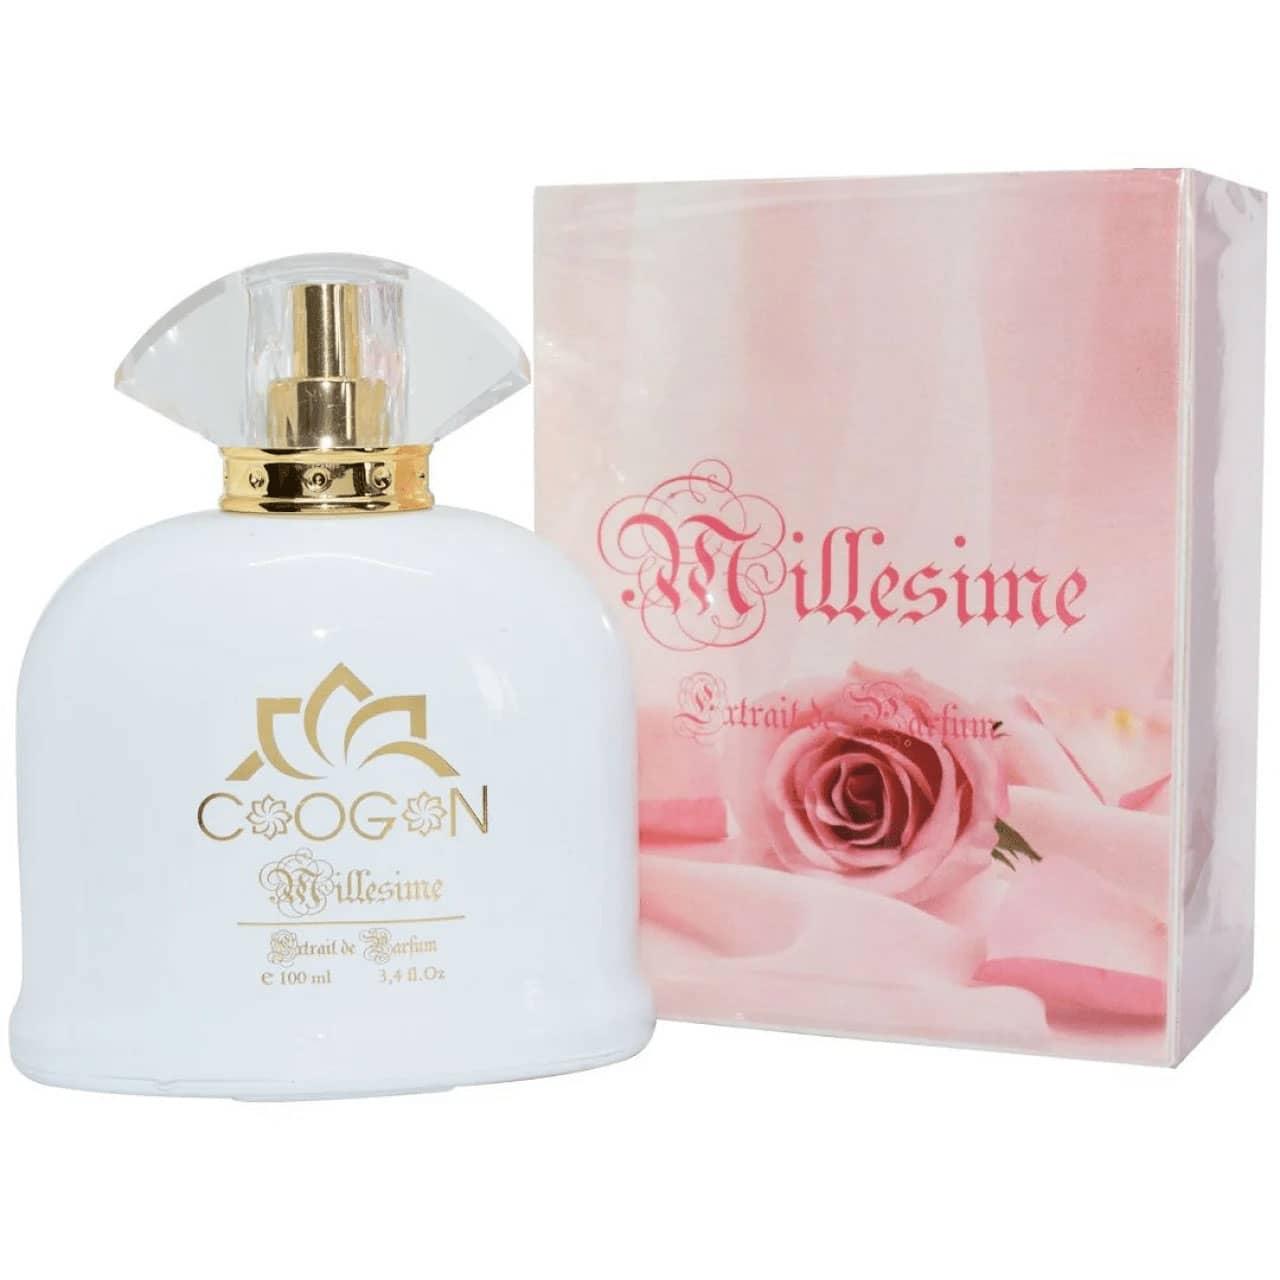 Parfum-femme-ref-006-100ml